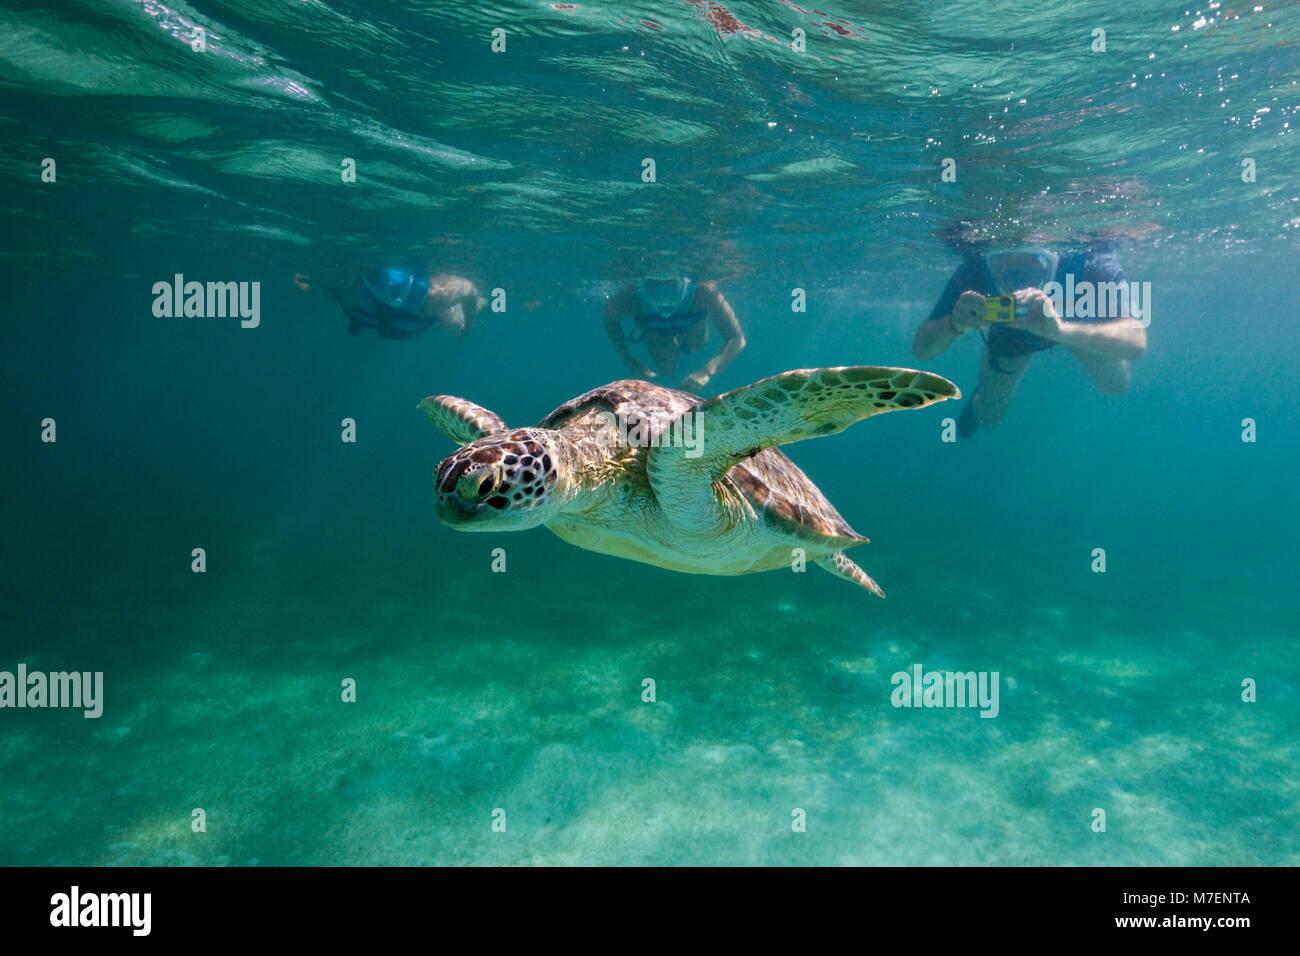 Los buceadores ver tortugas marinas verdes, Chelonia mydas, Akumal, Tulum, México Imagen De Stock